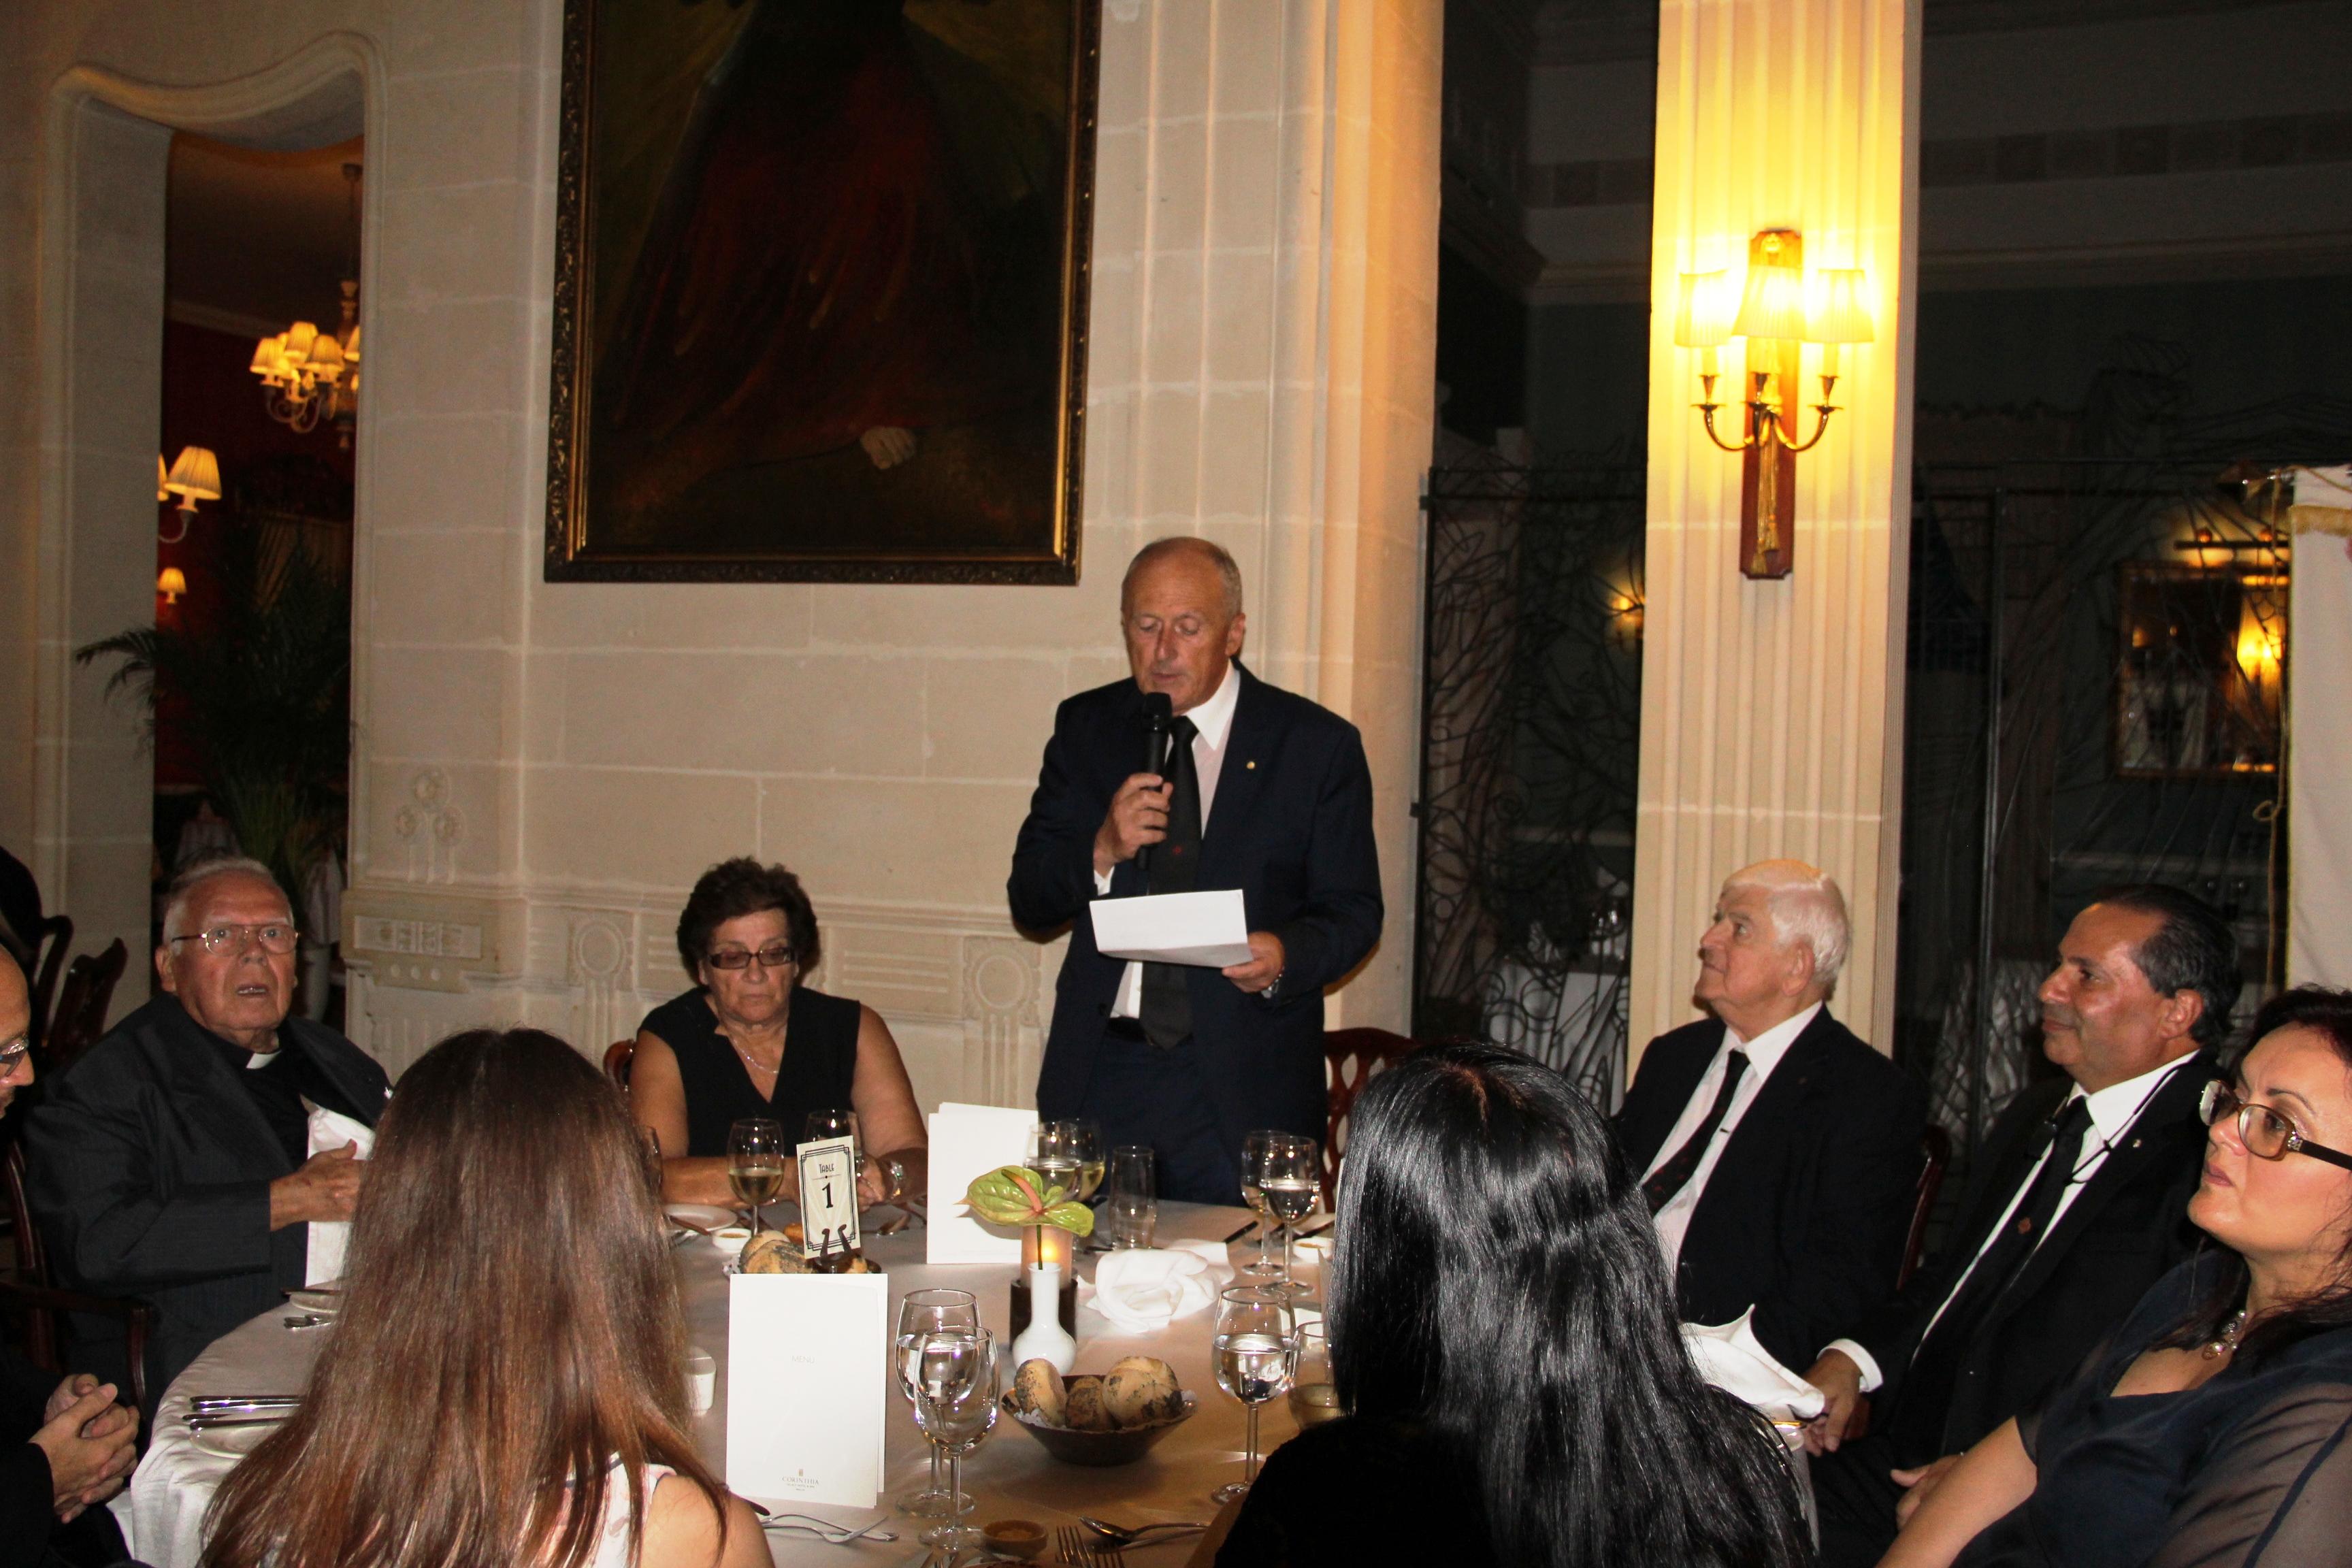 H.E. the Lieutenant delivering a memorable speech before dinner